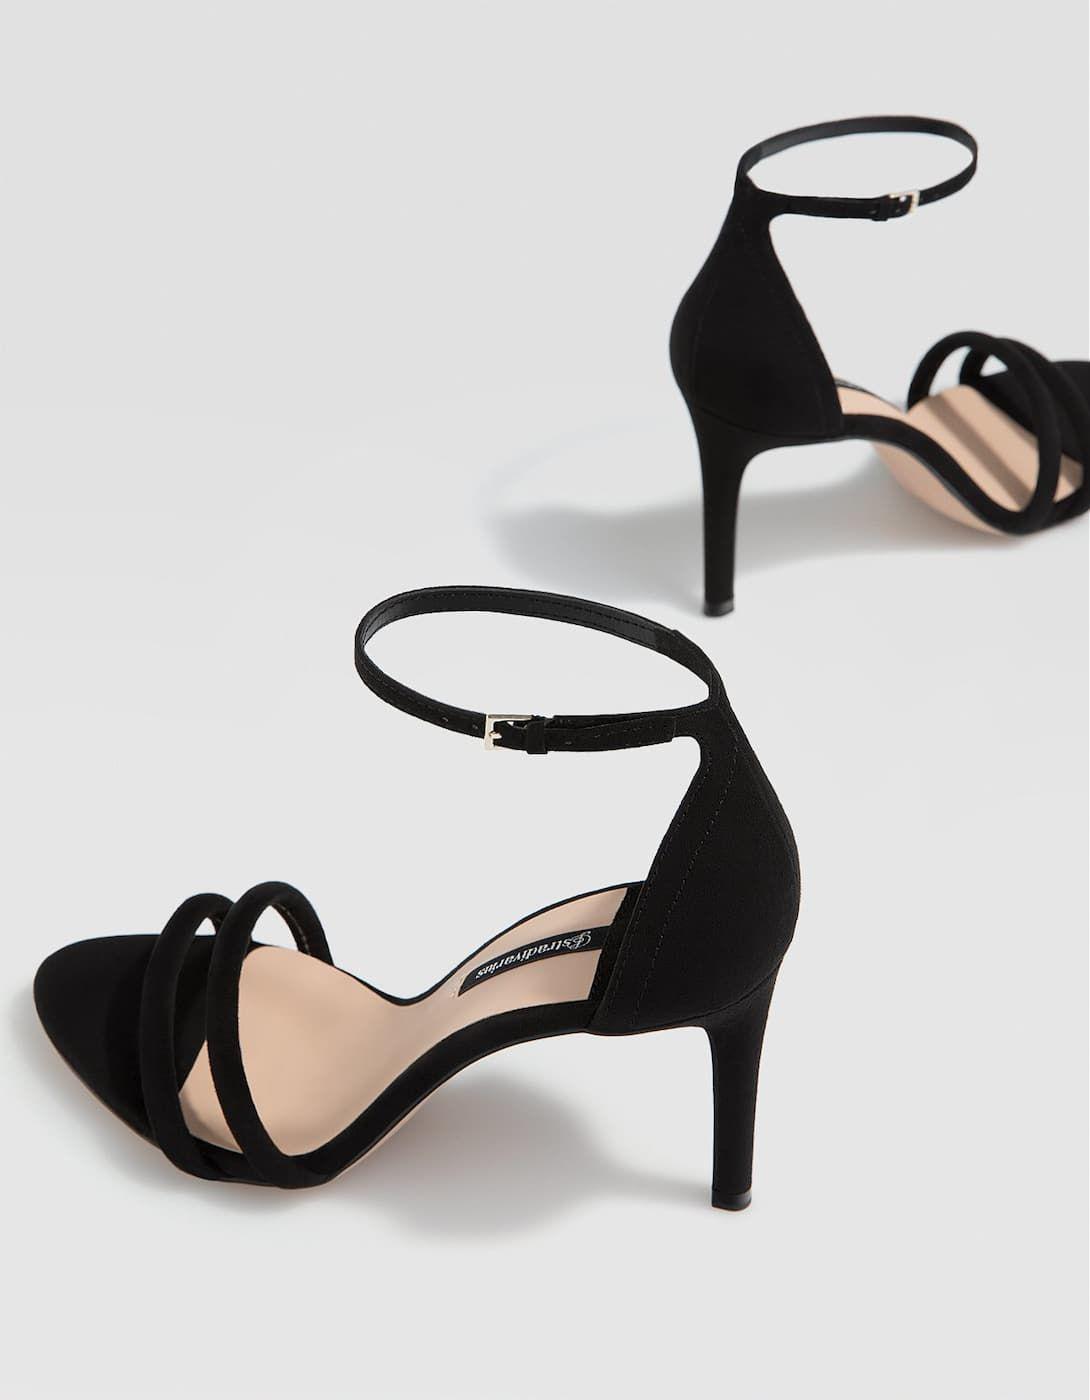 Sandalia tacón fino negra - Sandalias de mujer  f3aae01f3a6